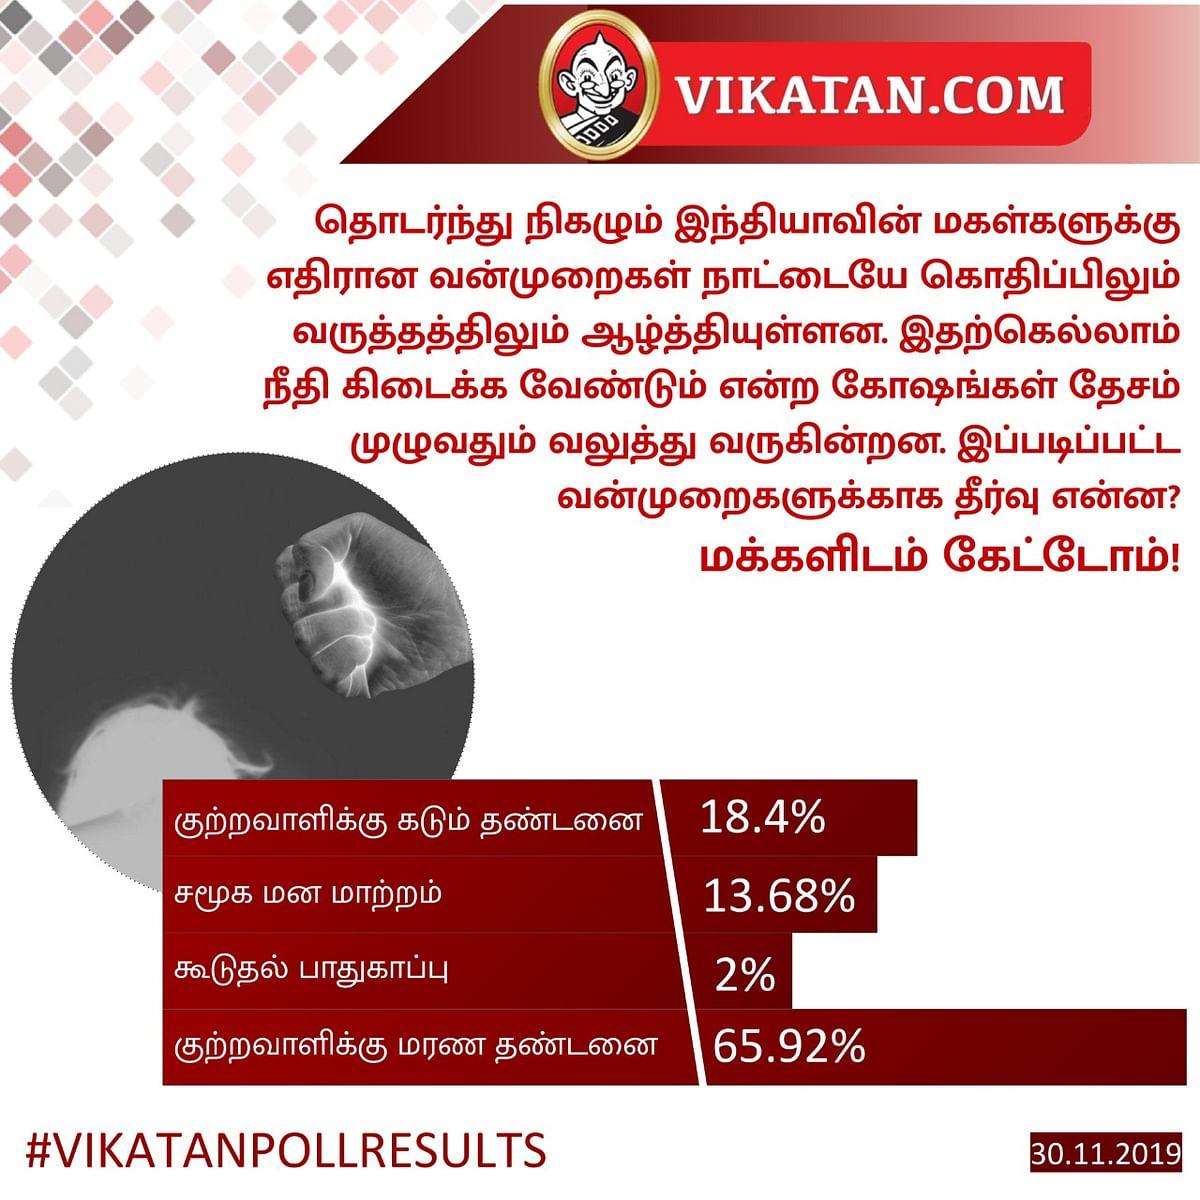 Vikatan Poll Results